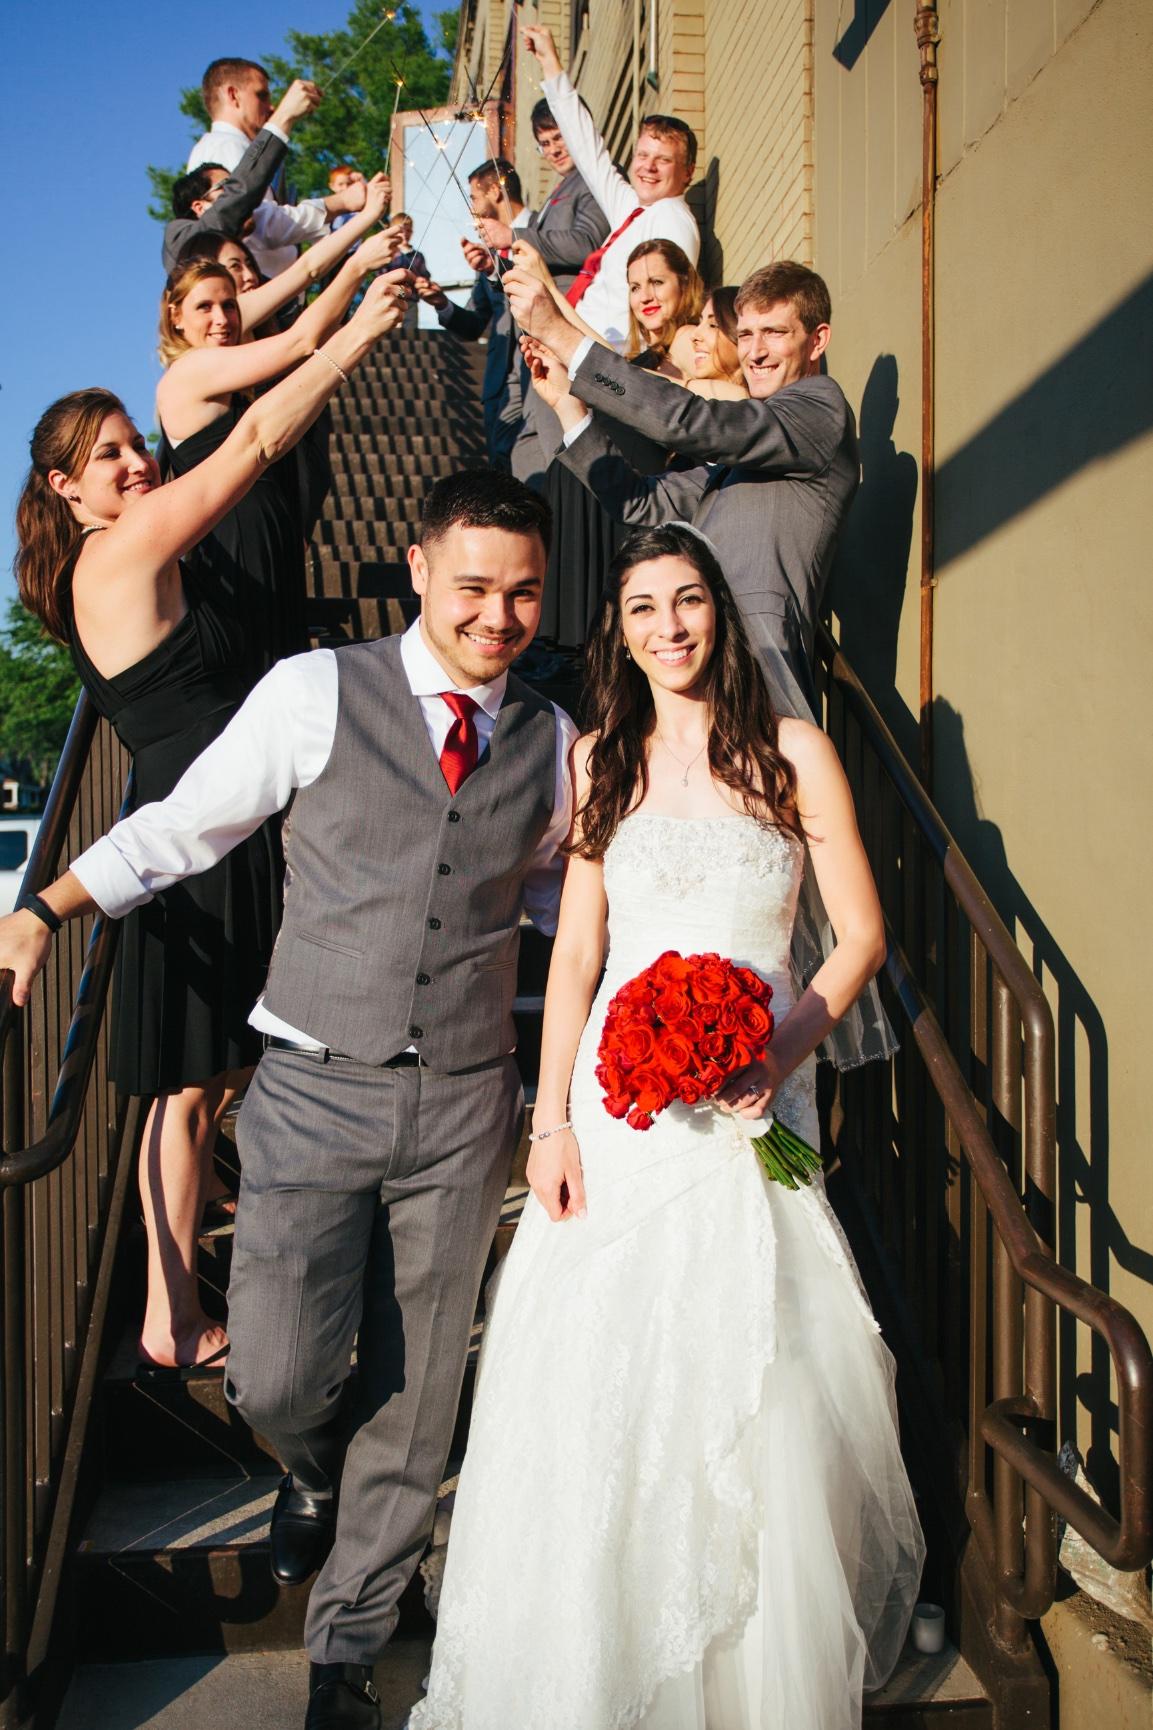 Avondale park birmingham wedding